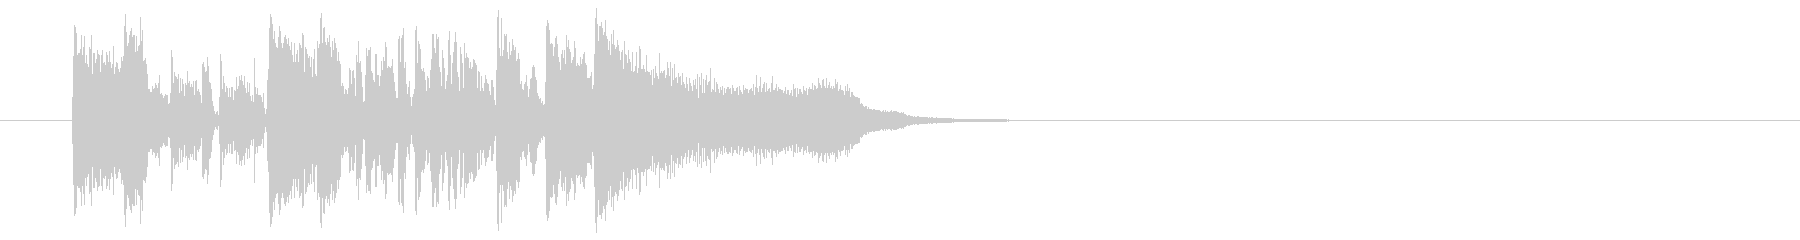 Jingle / New Information (Fusion)'s unreproduced waveform